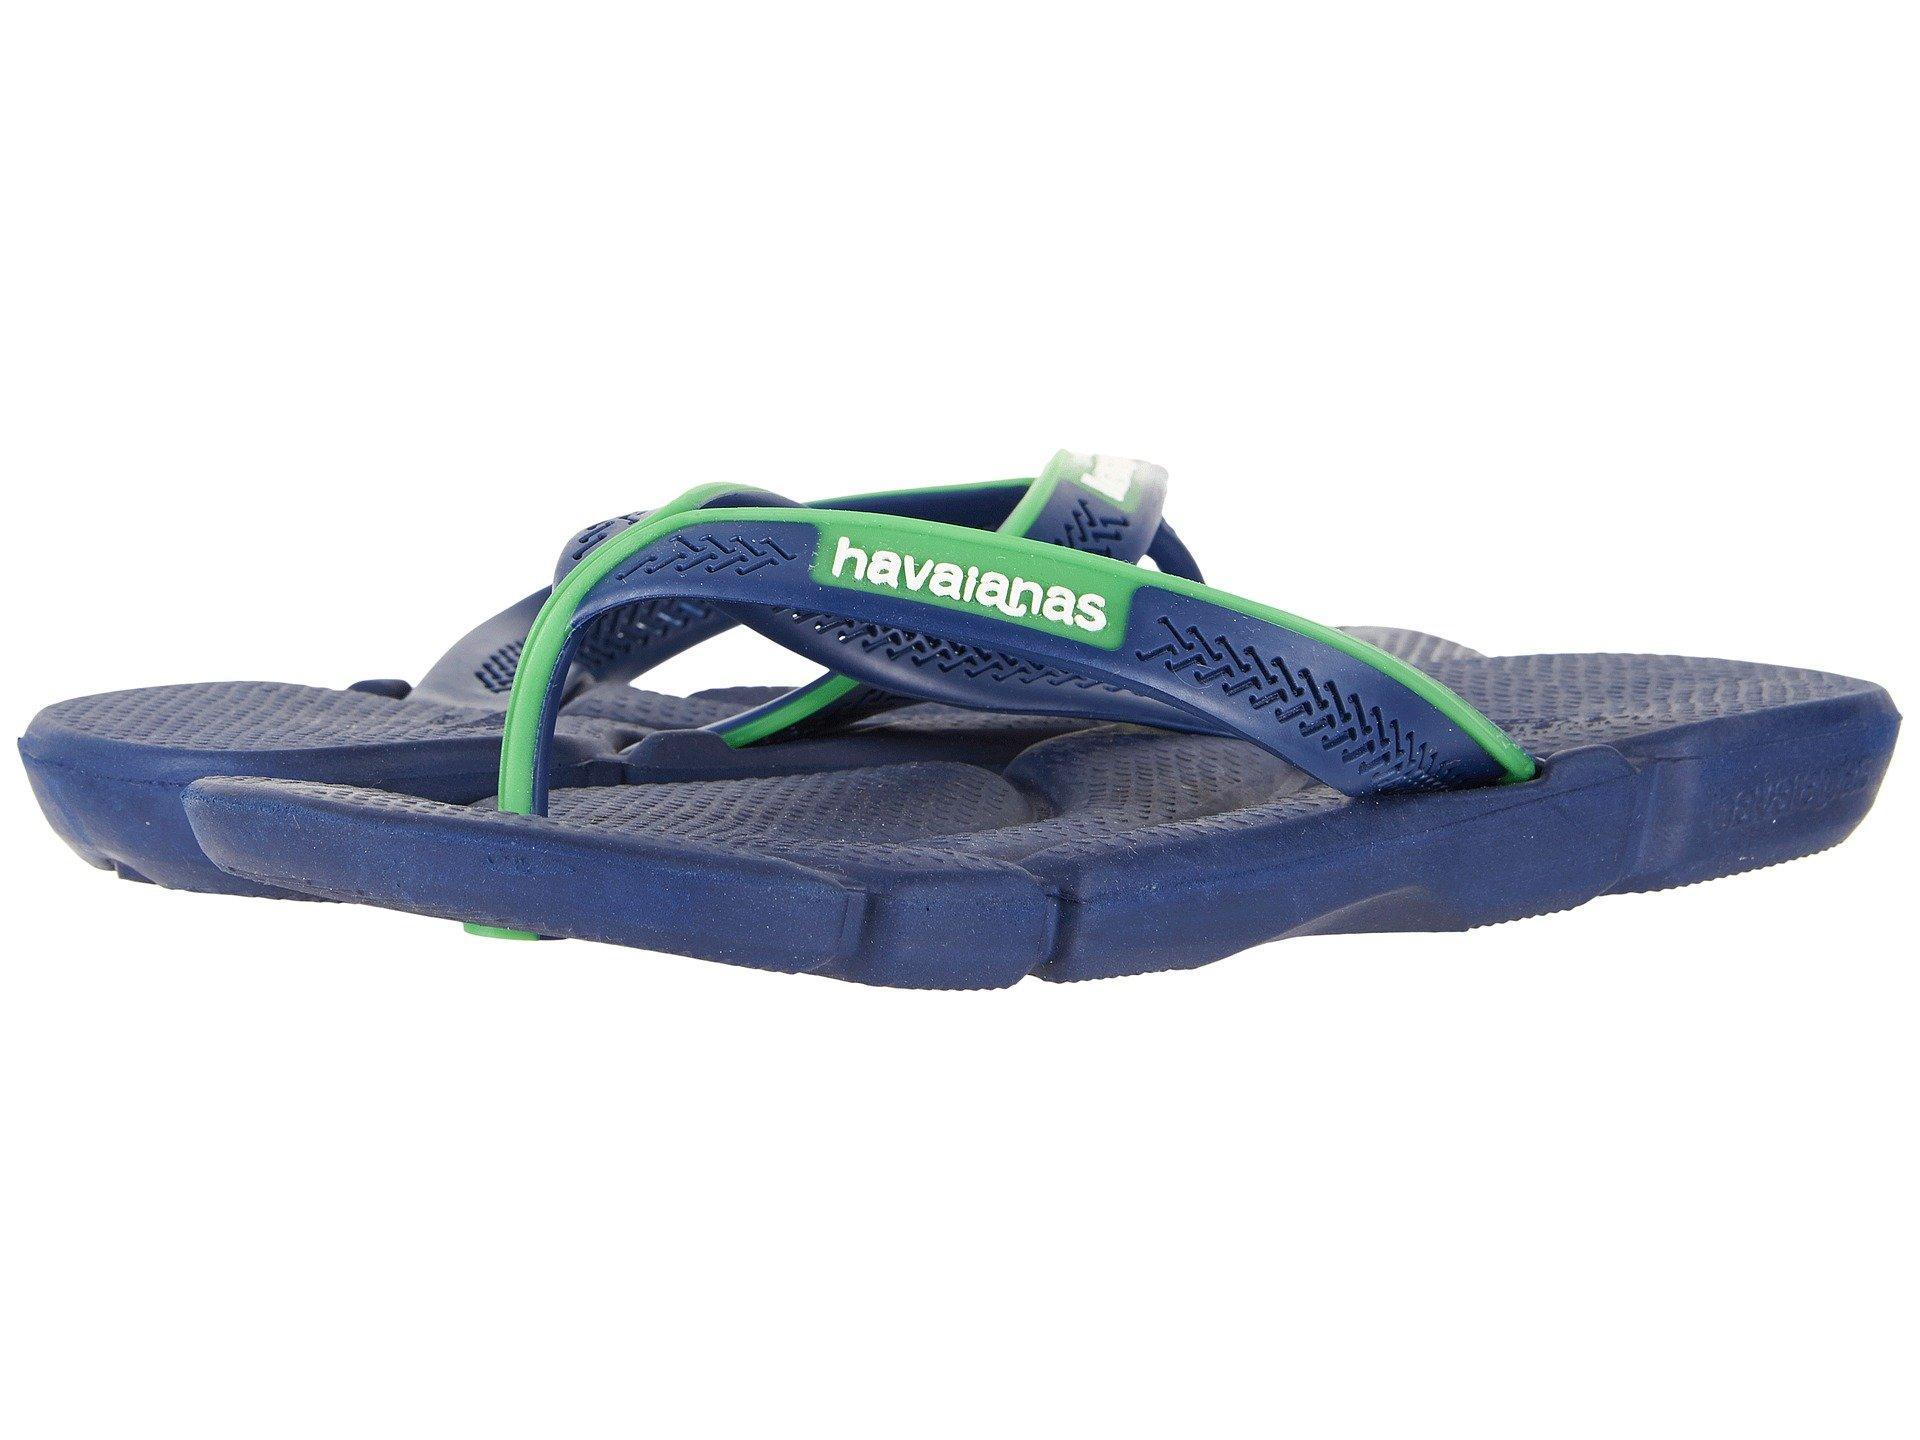 60964e31f Havaianas - Power Flip Flops (marine Blue) Men s Sandals for Men - Lyst.  View fullscreen